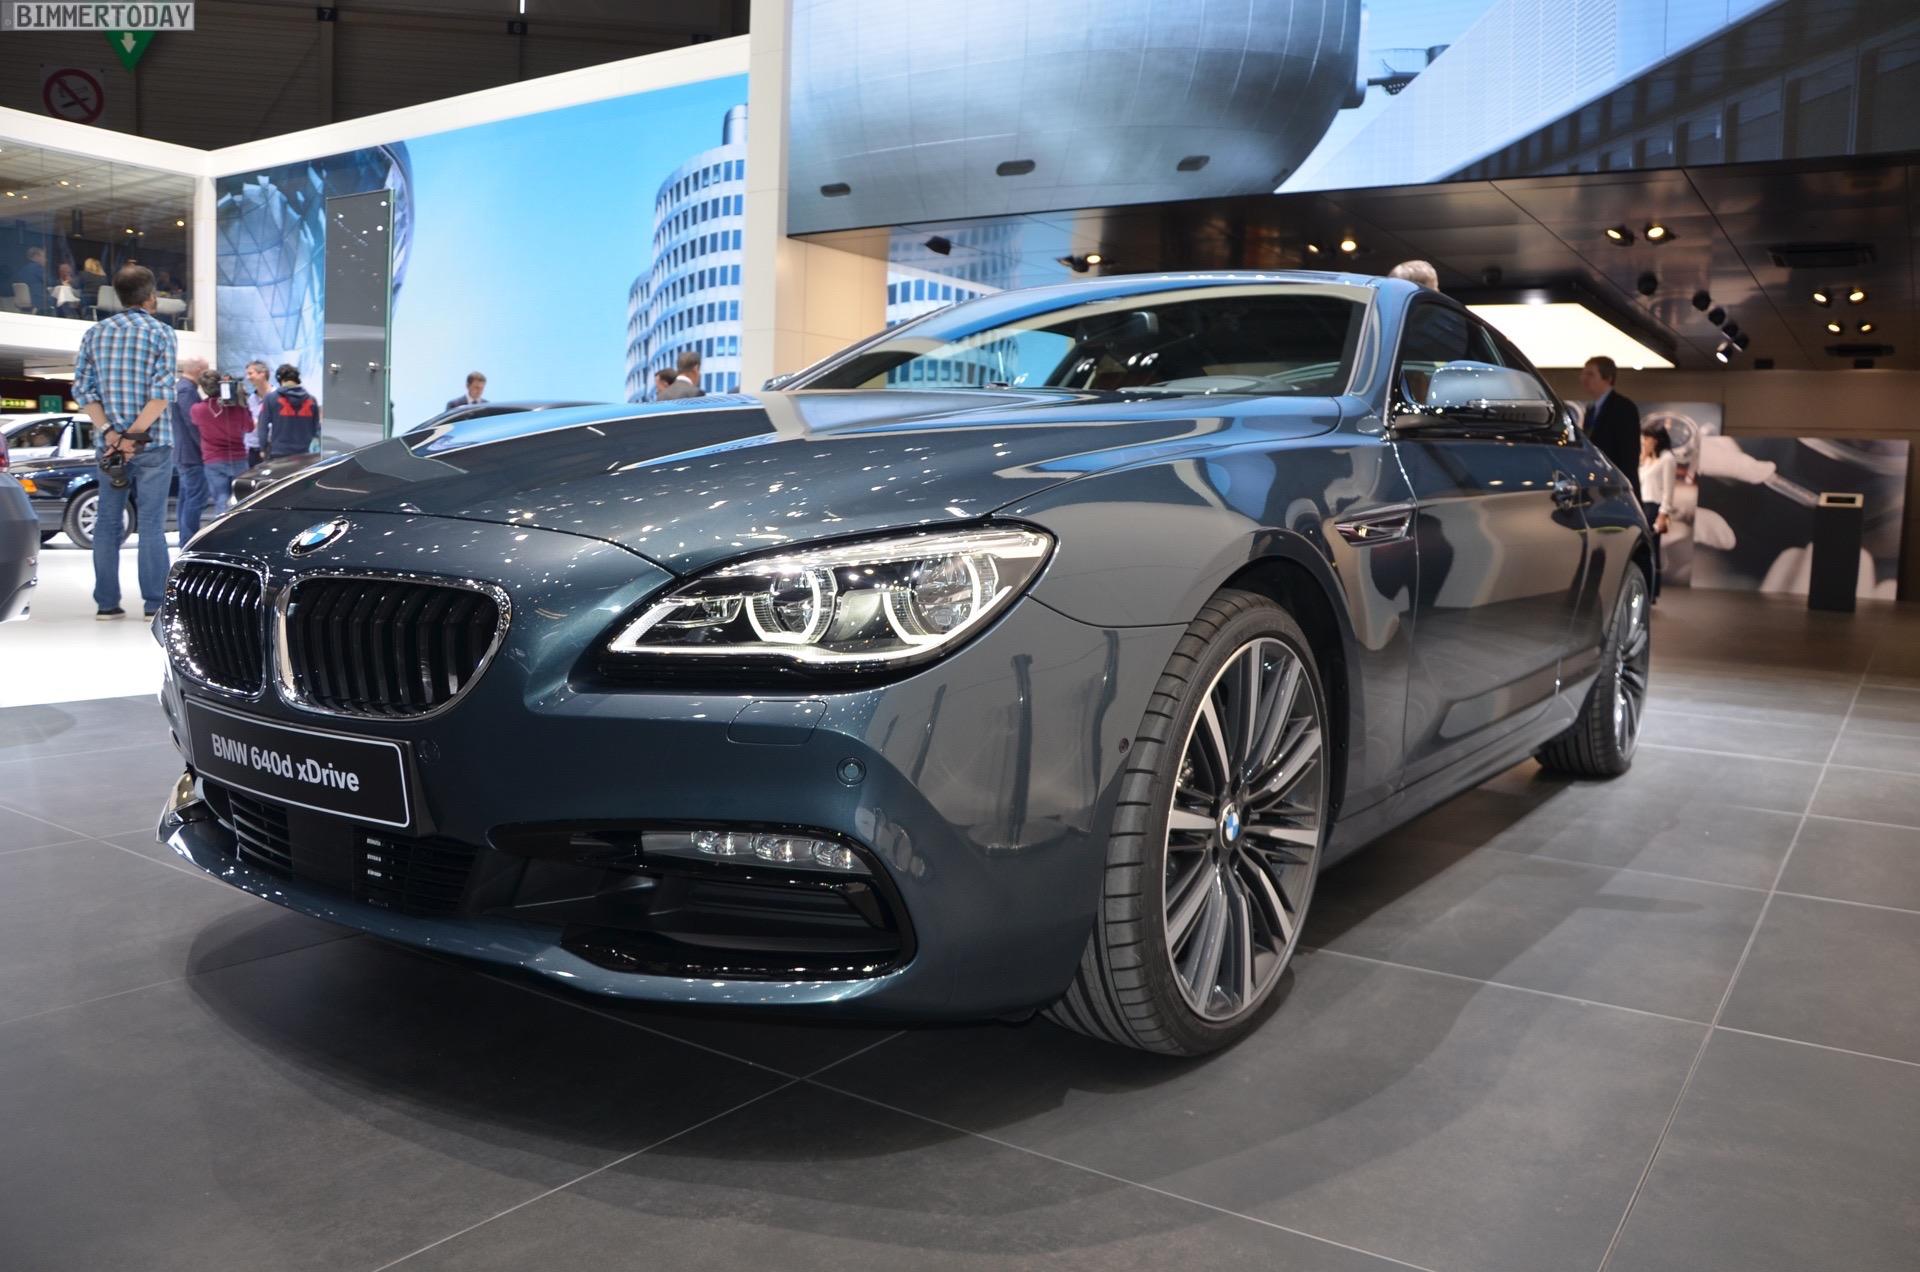 BMW 6er Coupe F13 Individual Orinoco Metallic 640d xDrive 2016 Genf Autosalon Live 05